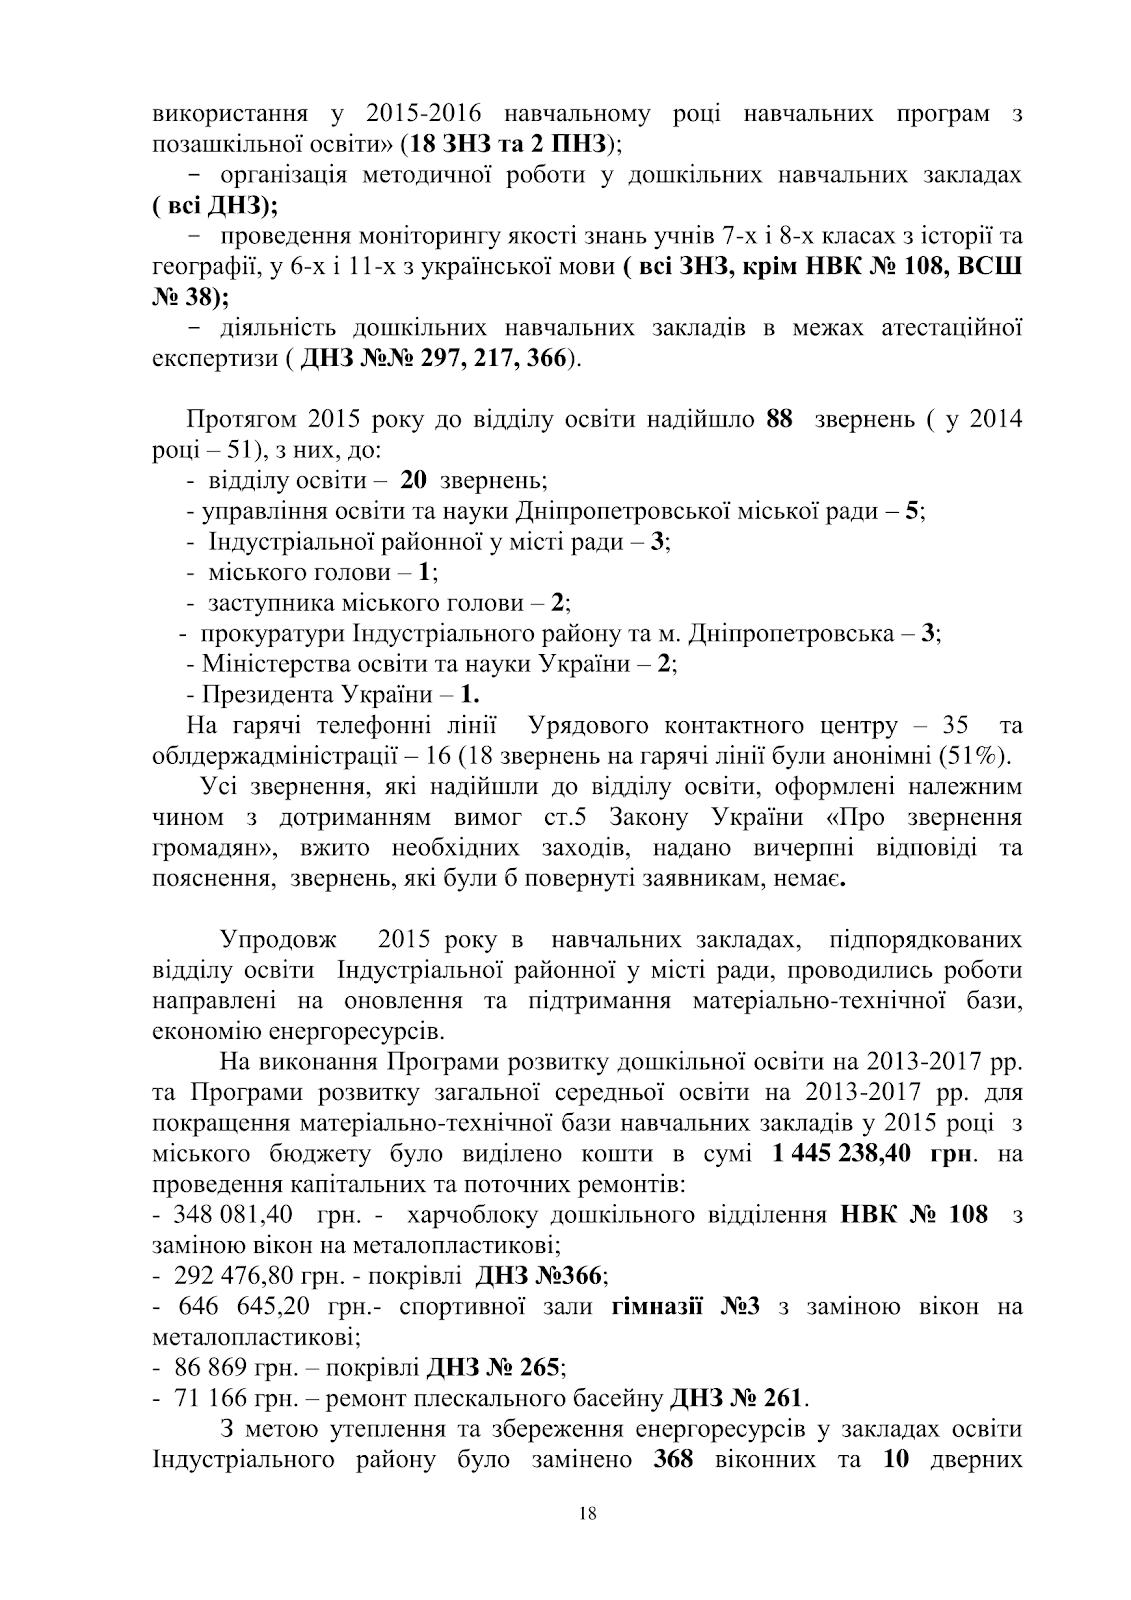 C:\Users\Валерия\Desktop\план 2016 рік\план 2016 рік-018.png